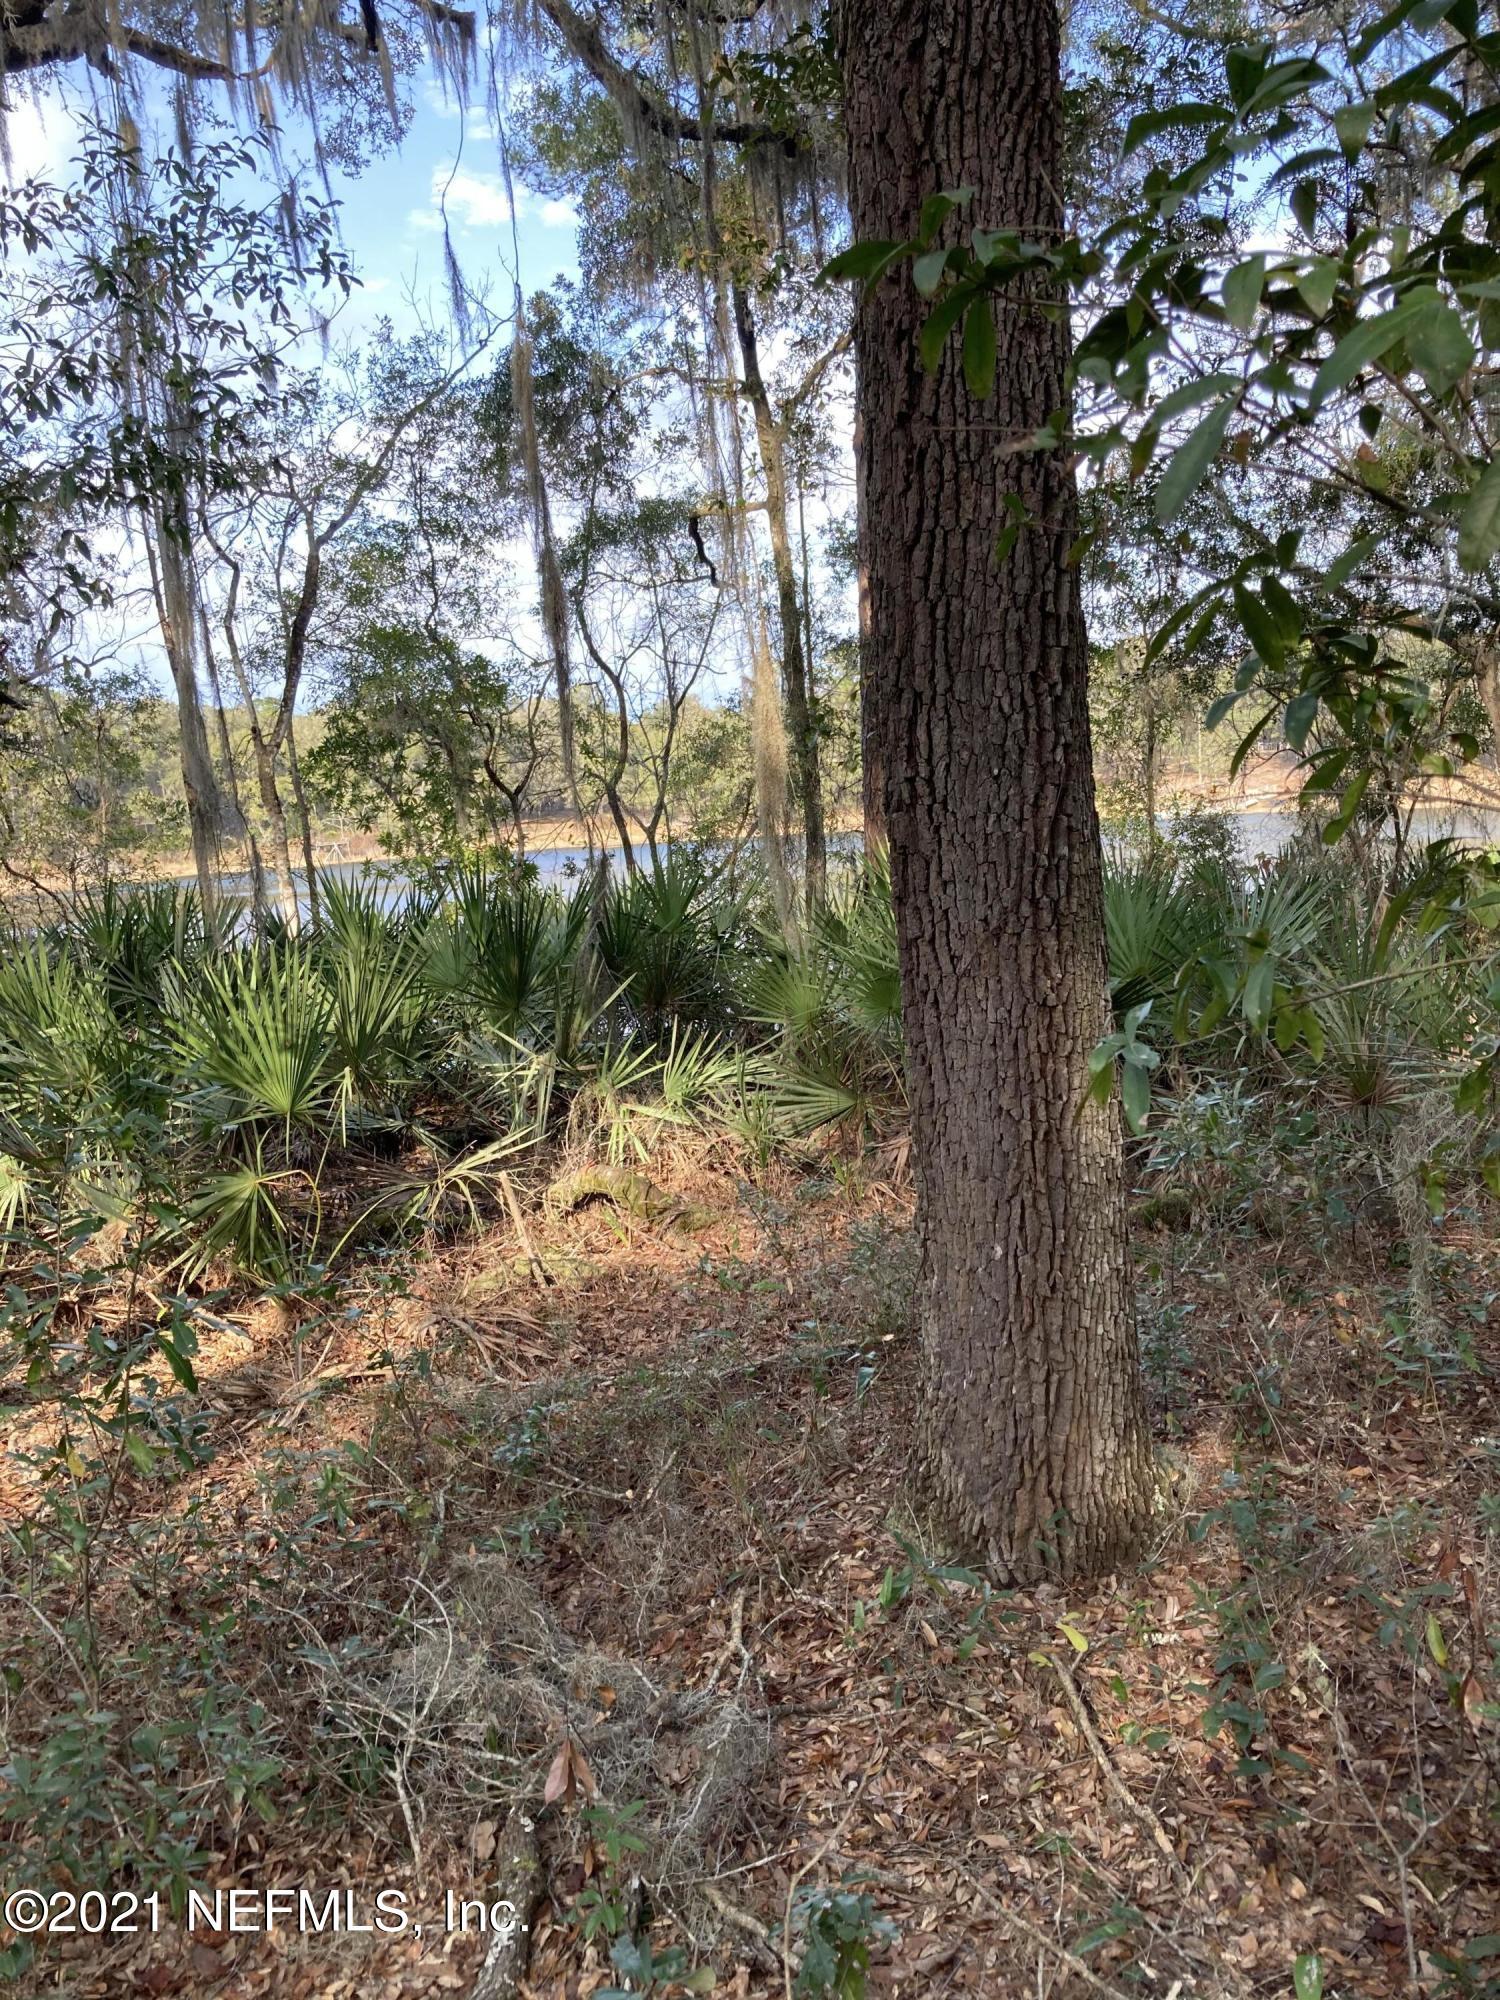 126 SUNSET, INTERLACHEN, FLORIDA 32148, ,Vacant land,For sale,SUNSET,1090381